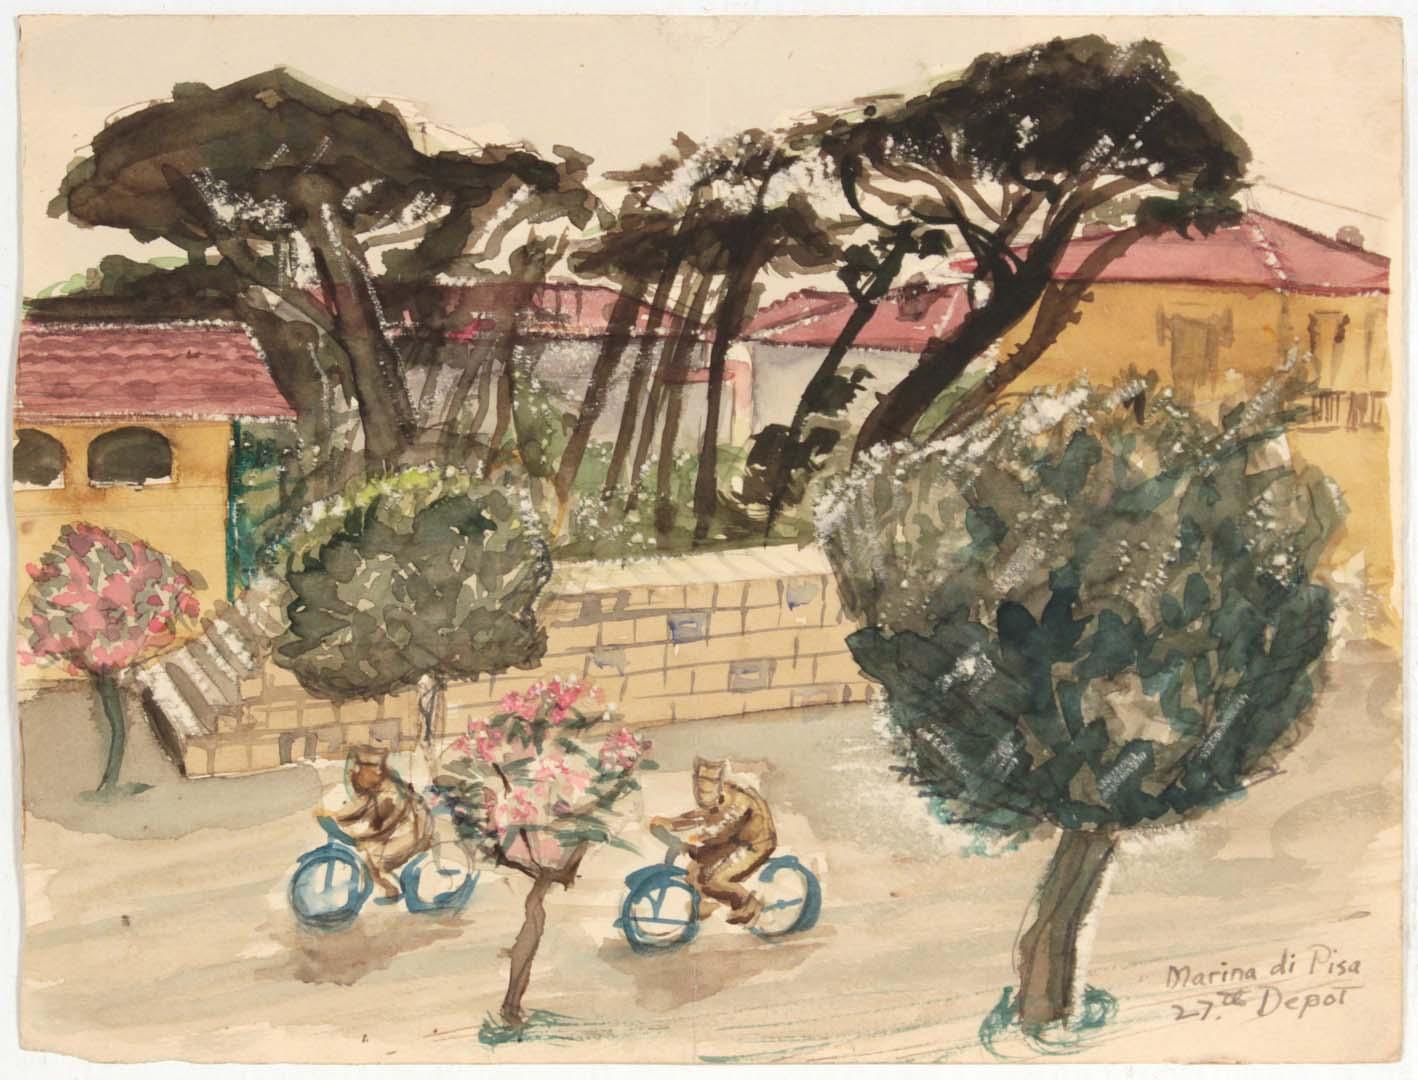 "1945 Marina Di Pisa IV 27th Depot Watercolor 6.9375"" x 9.125"""